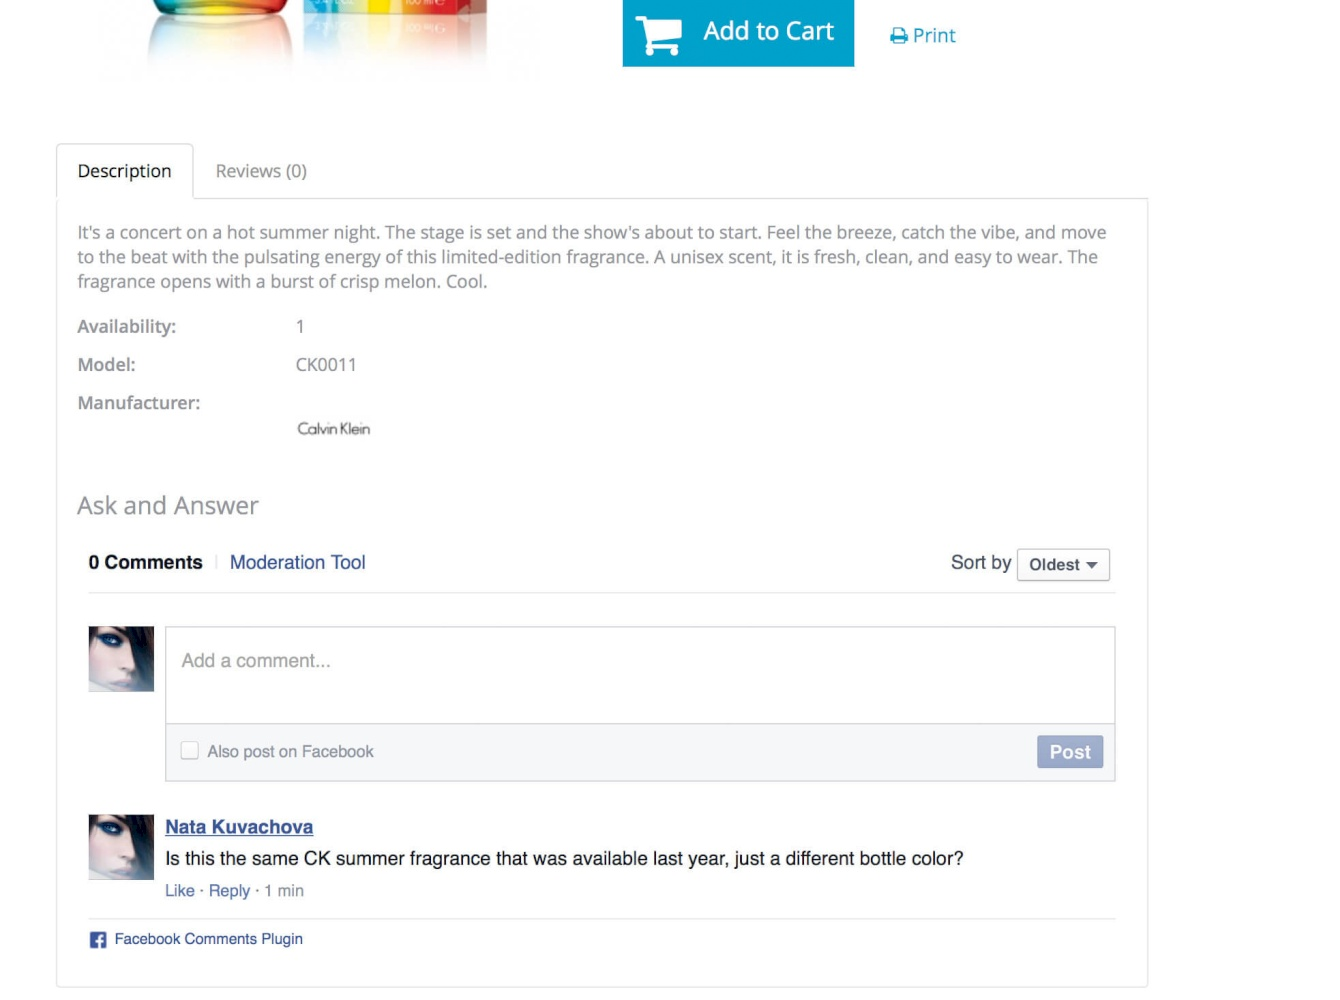 Abantecart Facebook comments